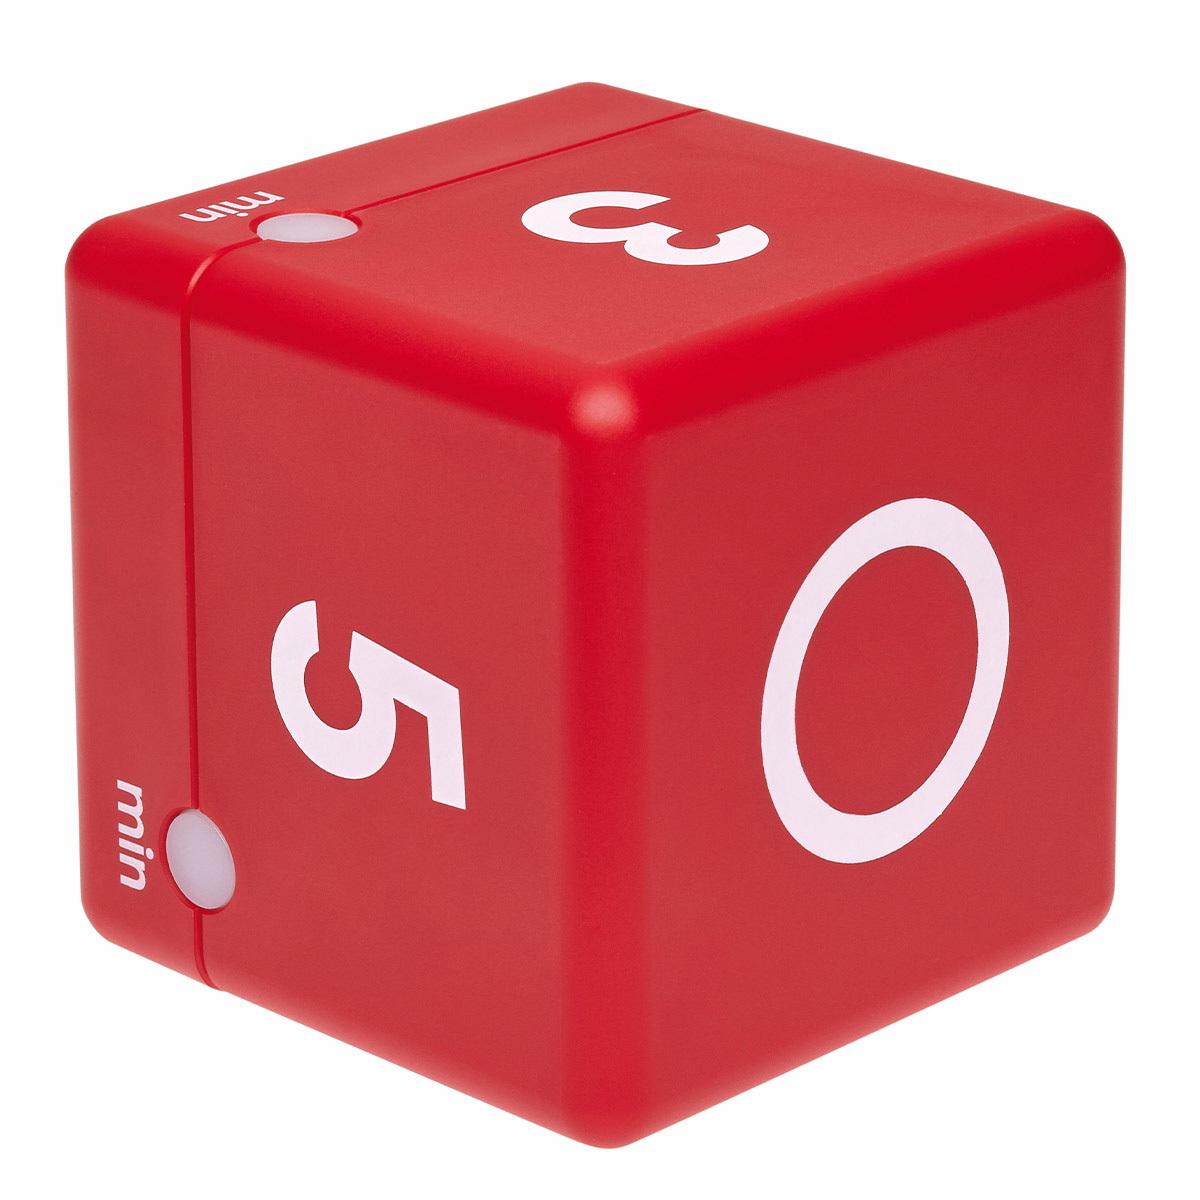 38-2039-05-digitaler-würfel-timer-cube-timer-ansicht-1200x1200px.jpg